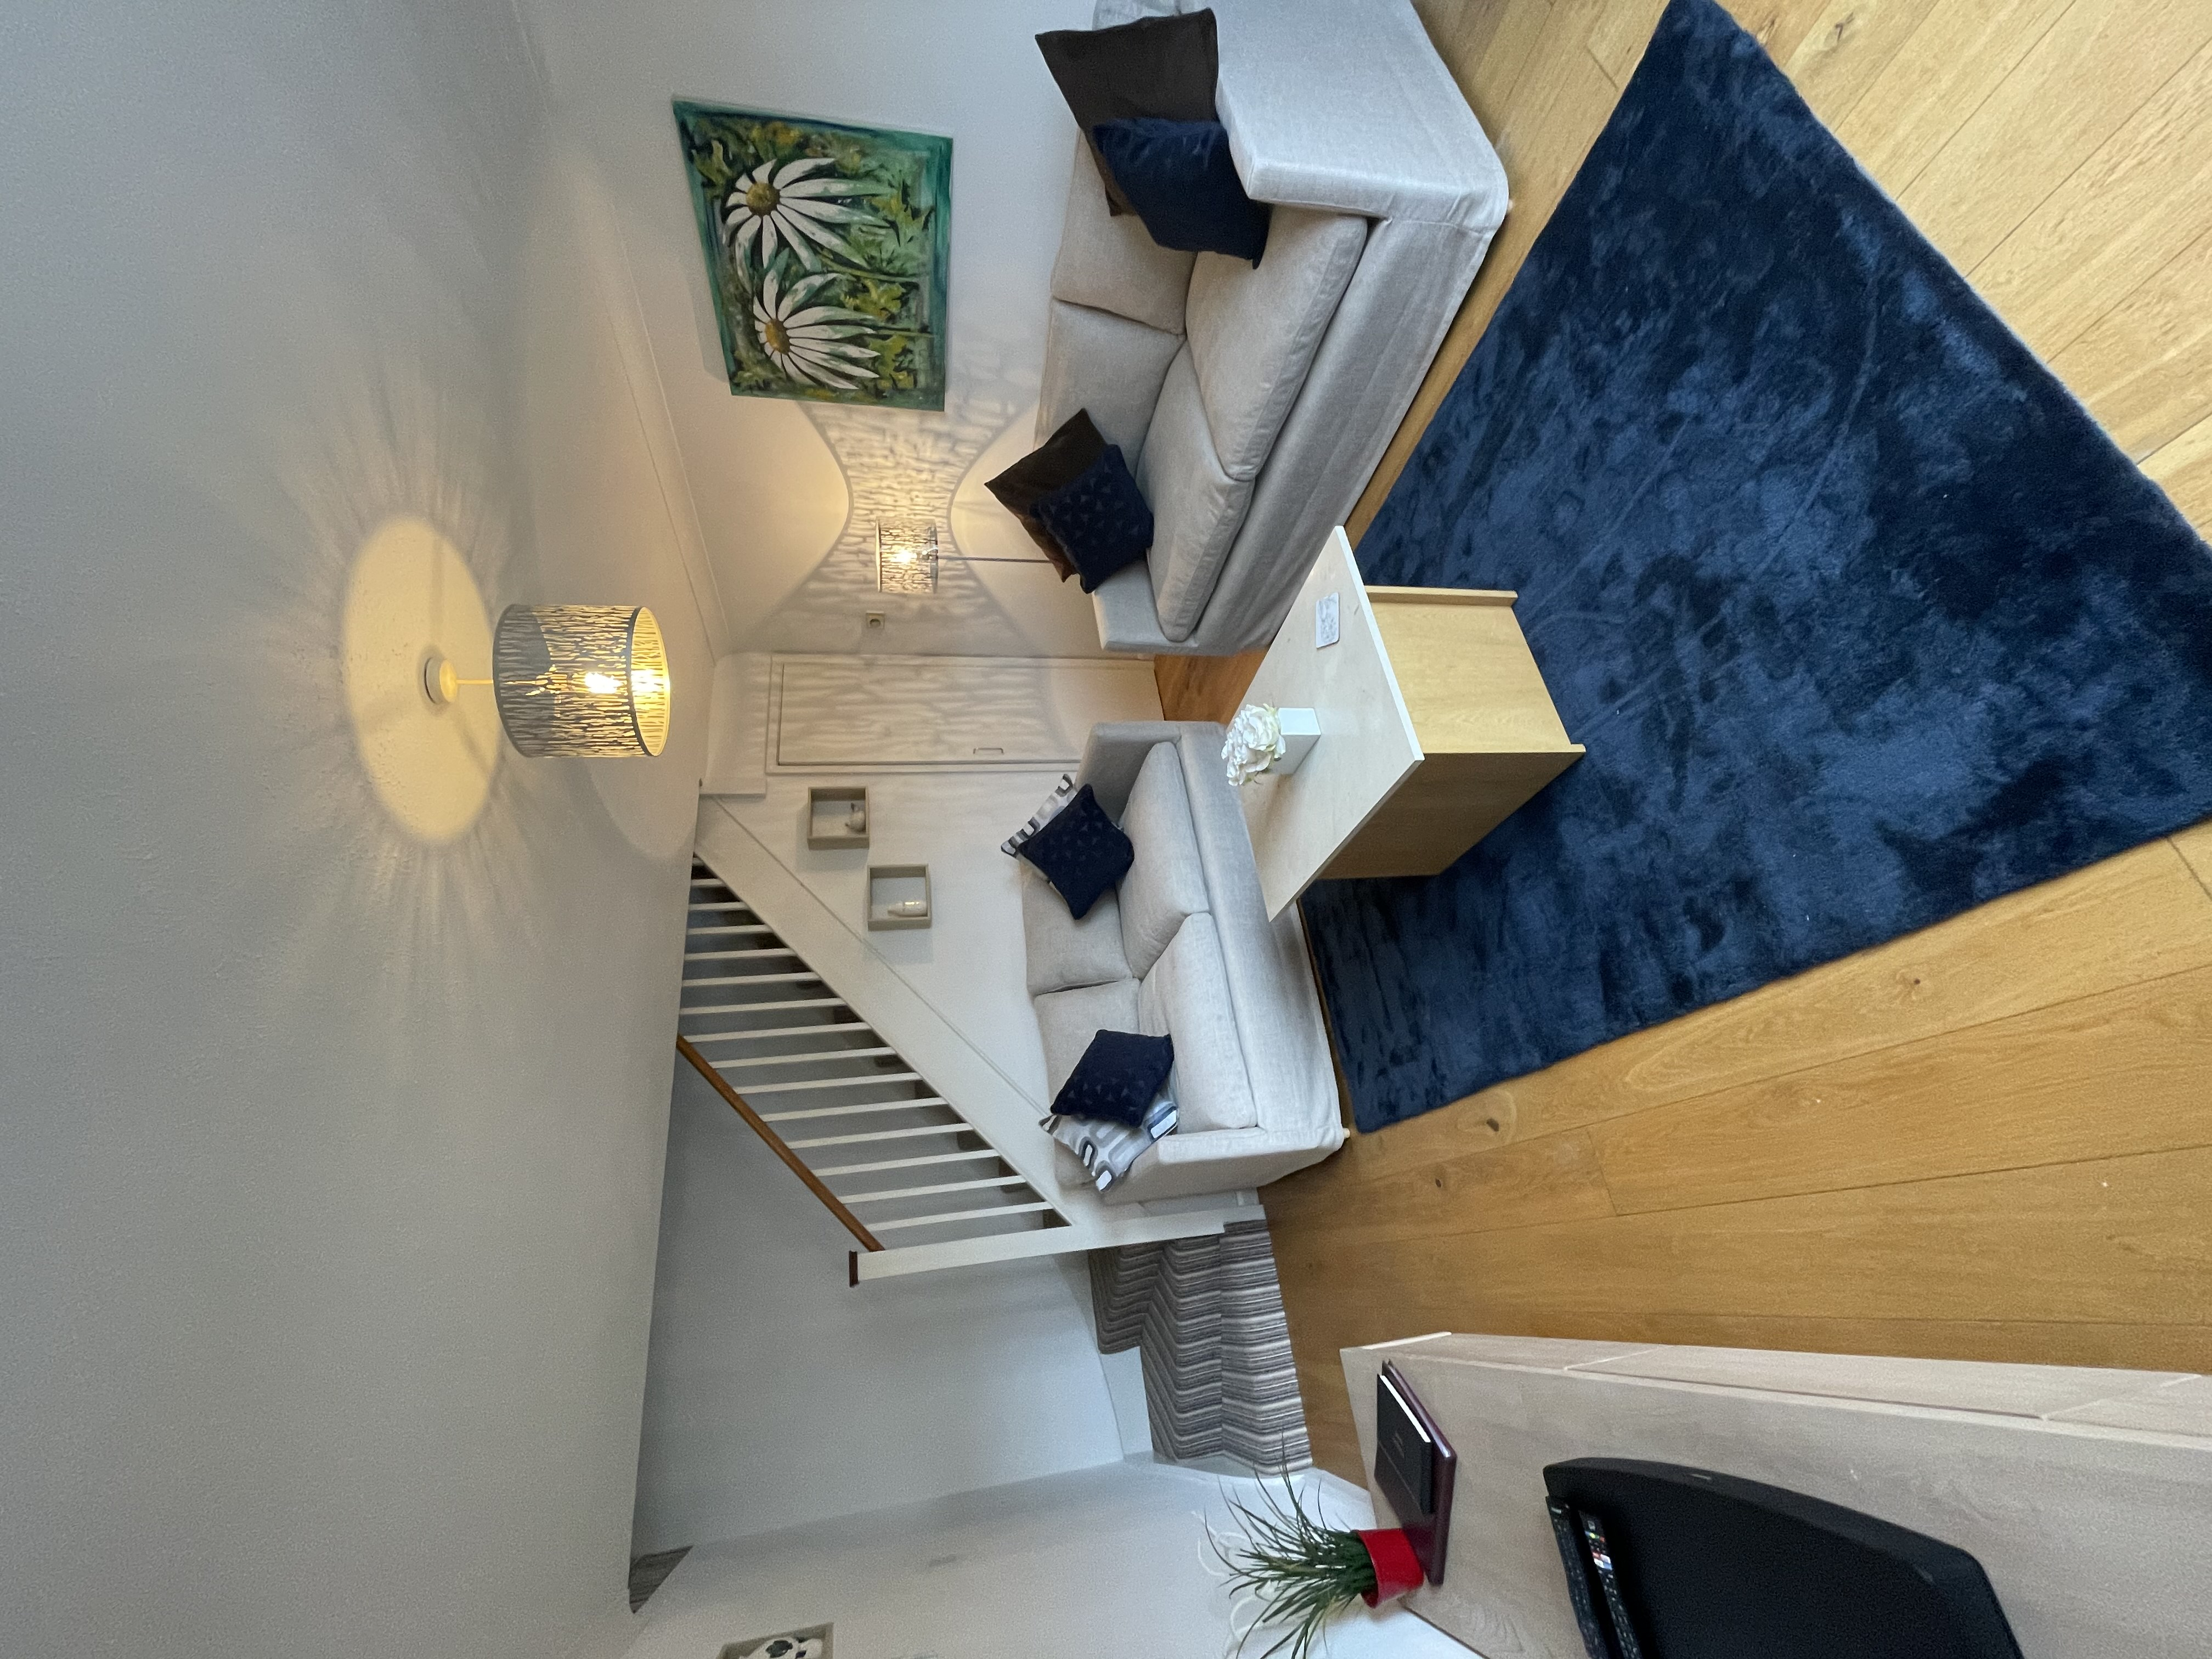 IMG_4673.jpg house lounge